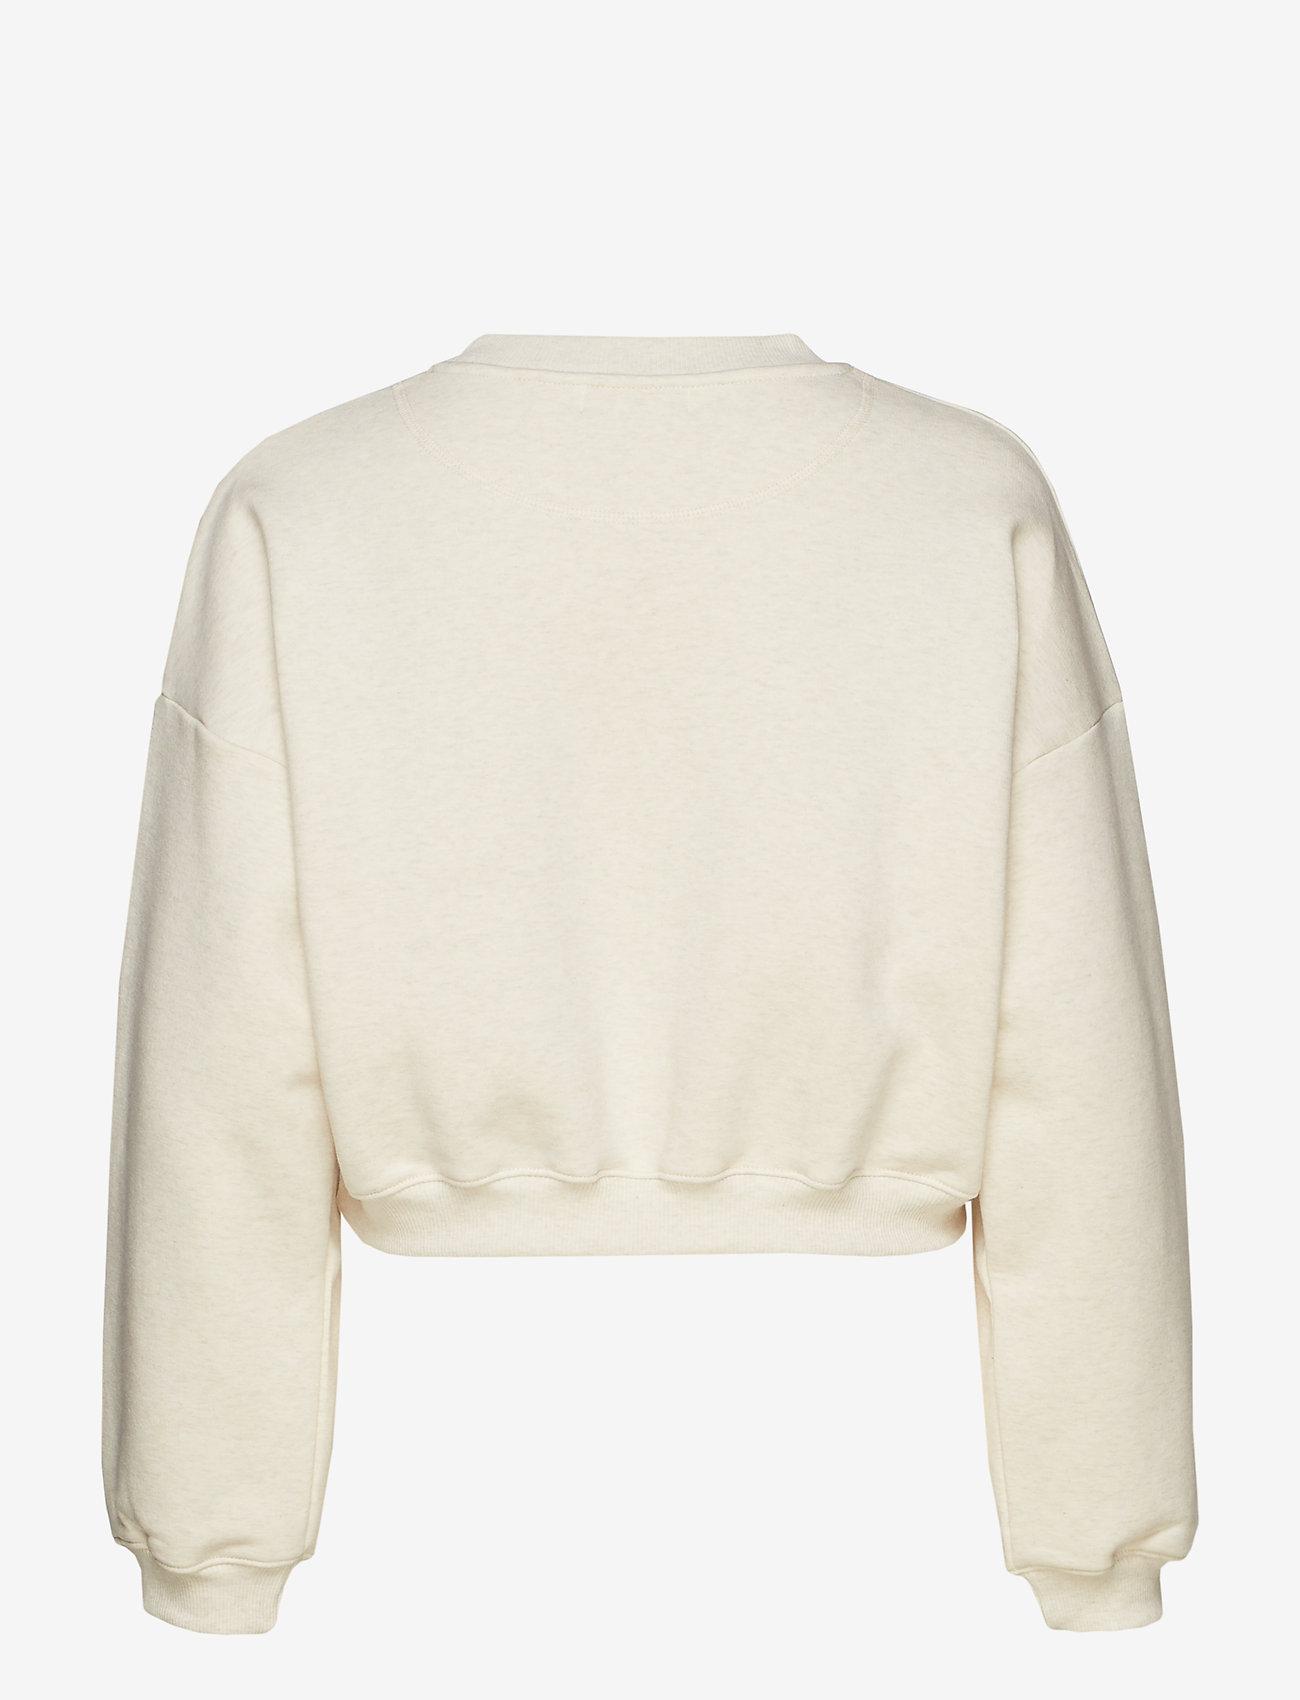 RODEBJER - RODEBJER KOLOMAN - sweatshirts & hættetrøjer - puffy white - 2